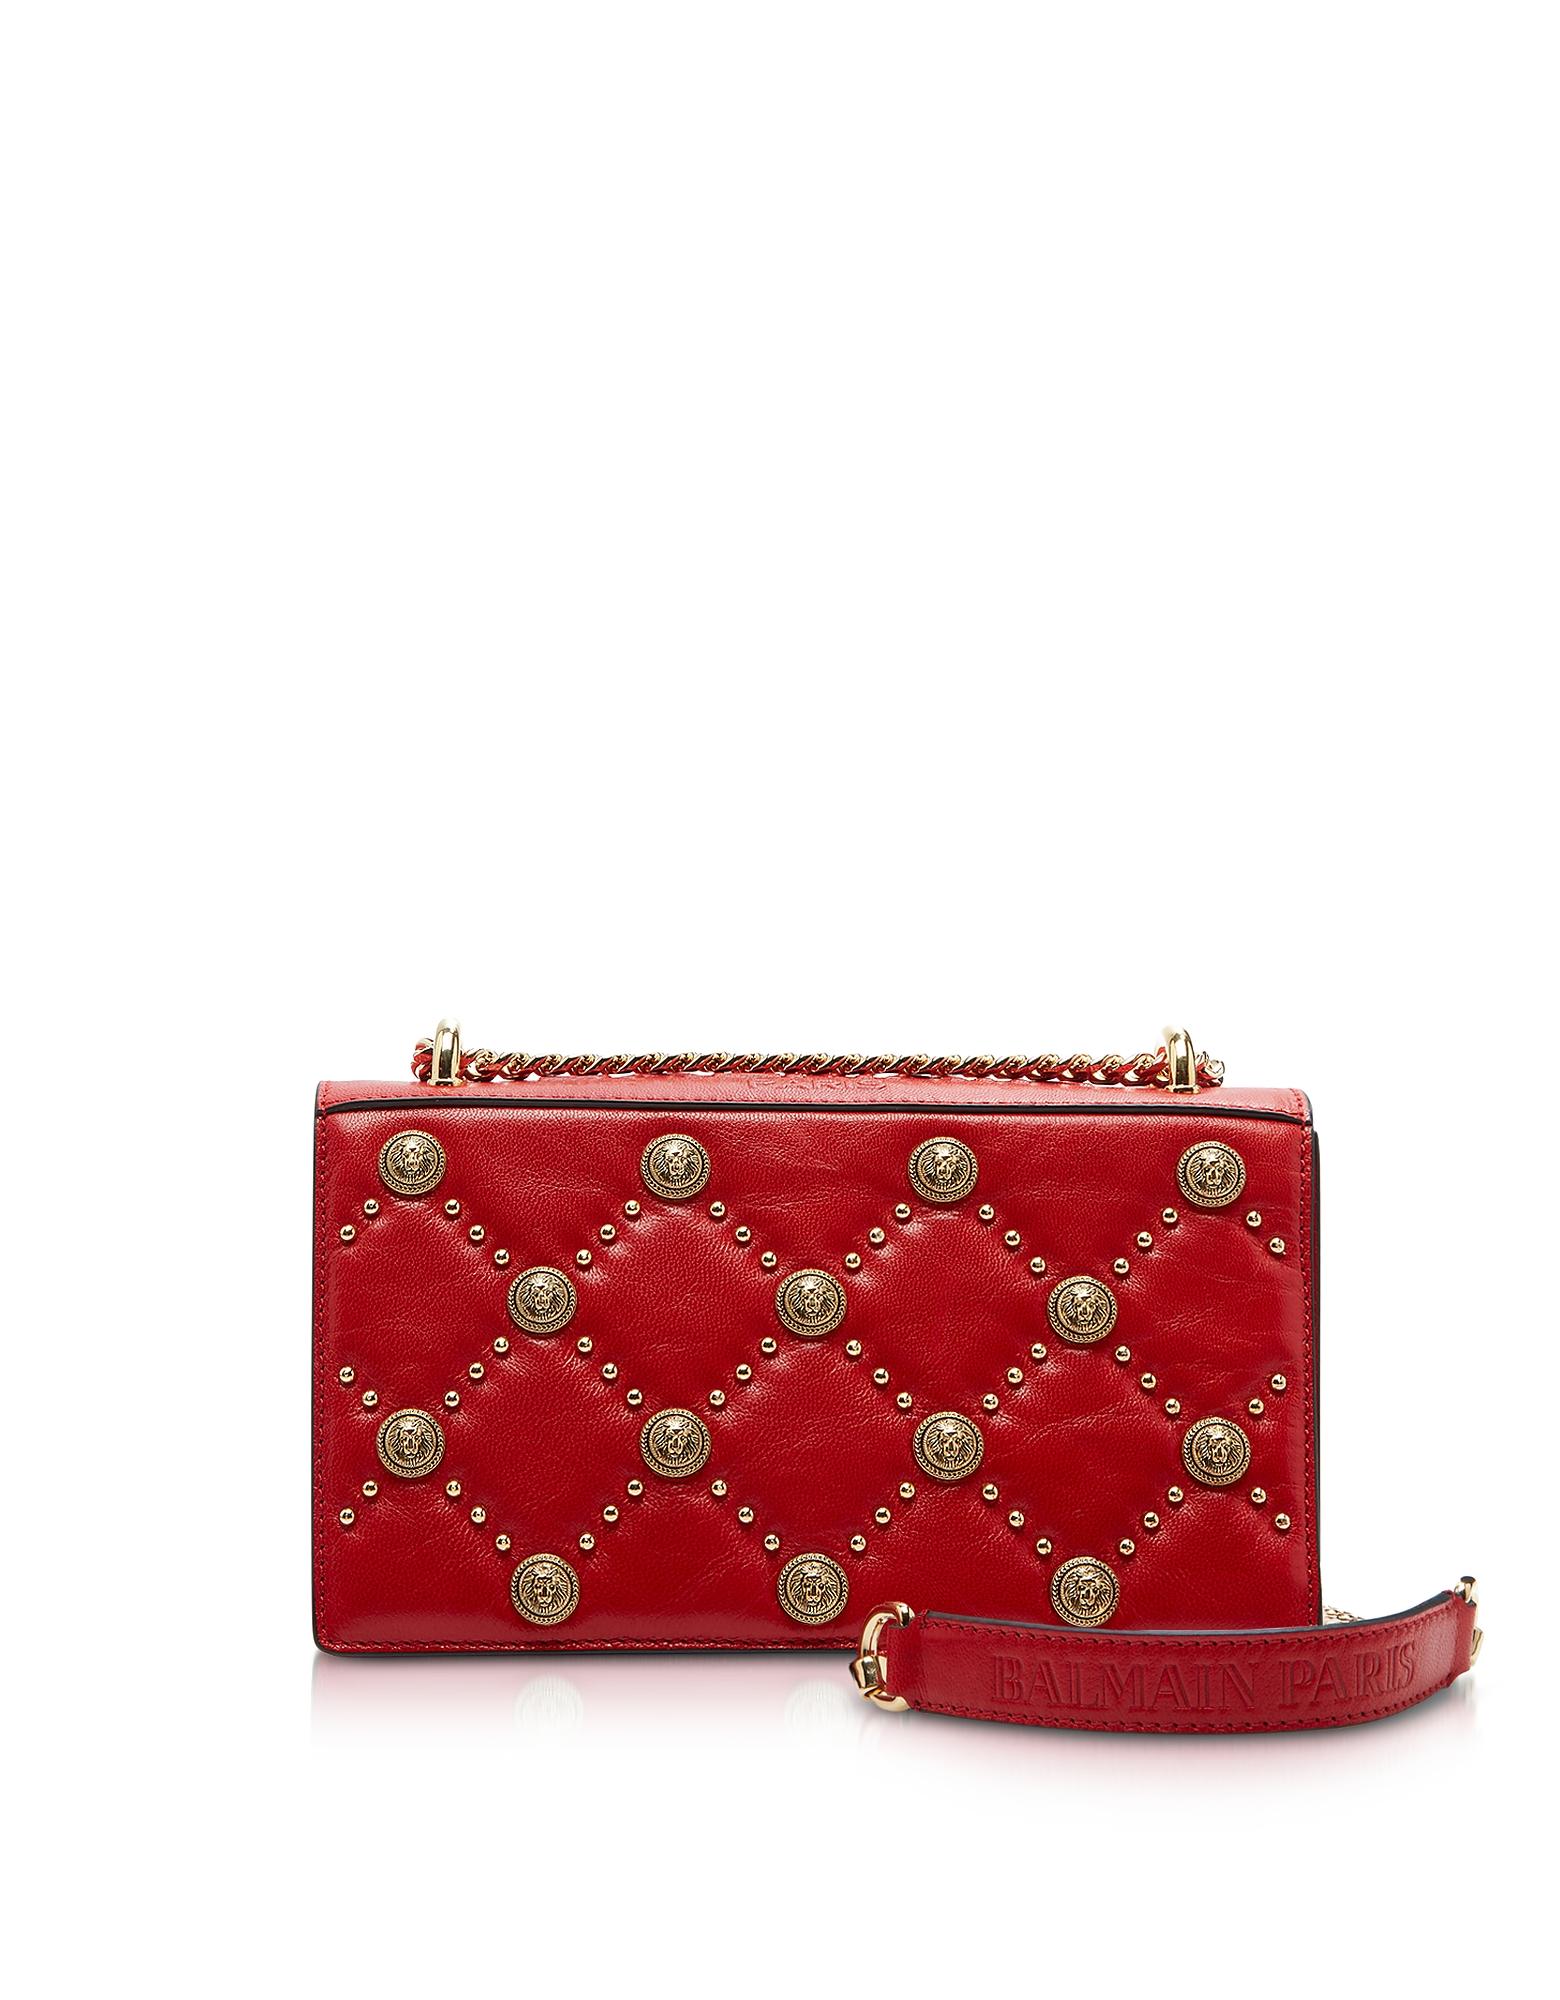 Balmain Handbags, Red Love Lion Flap Shoulder Bag